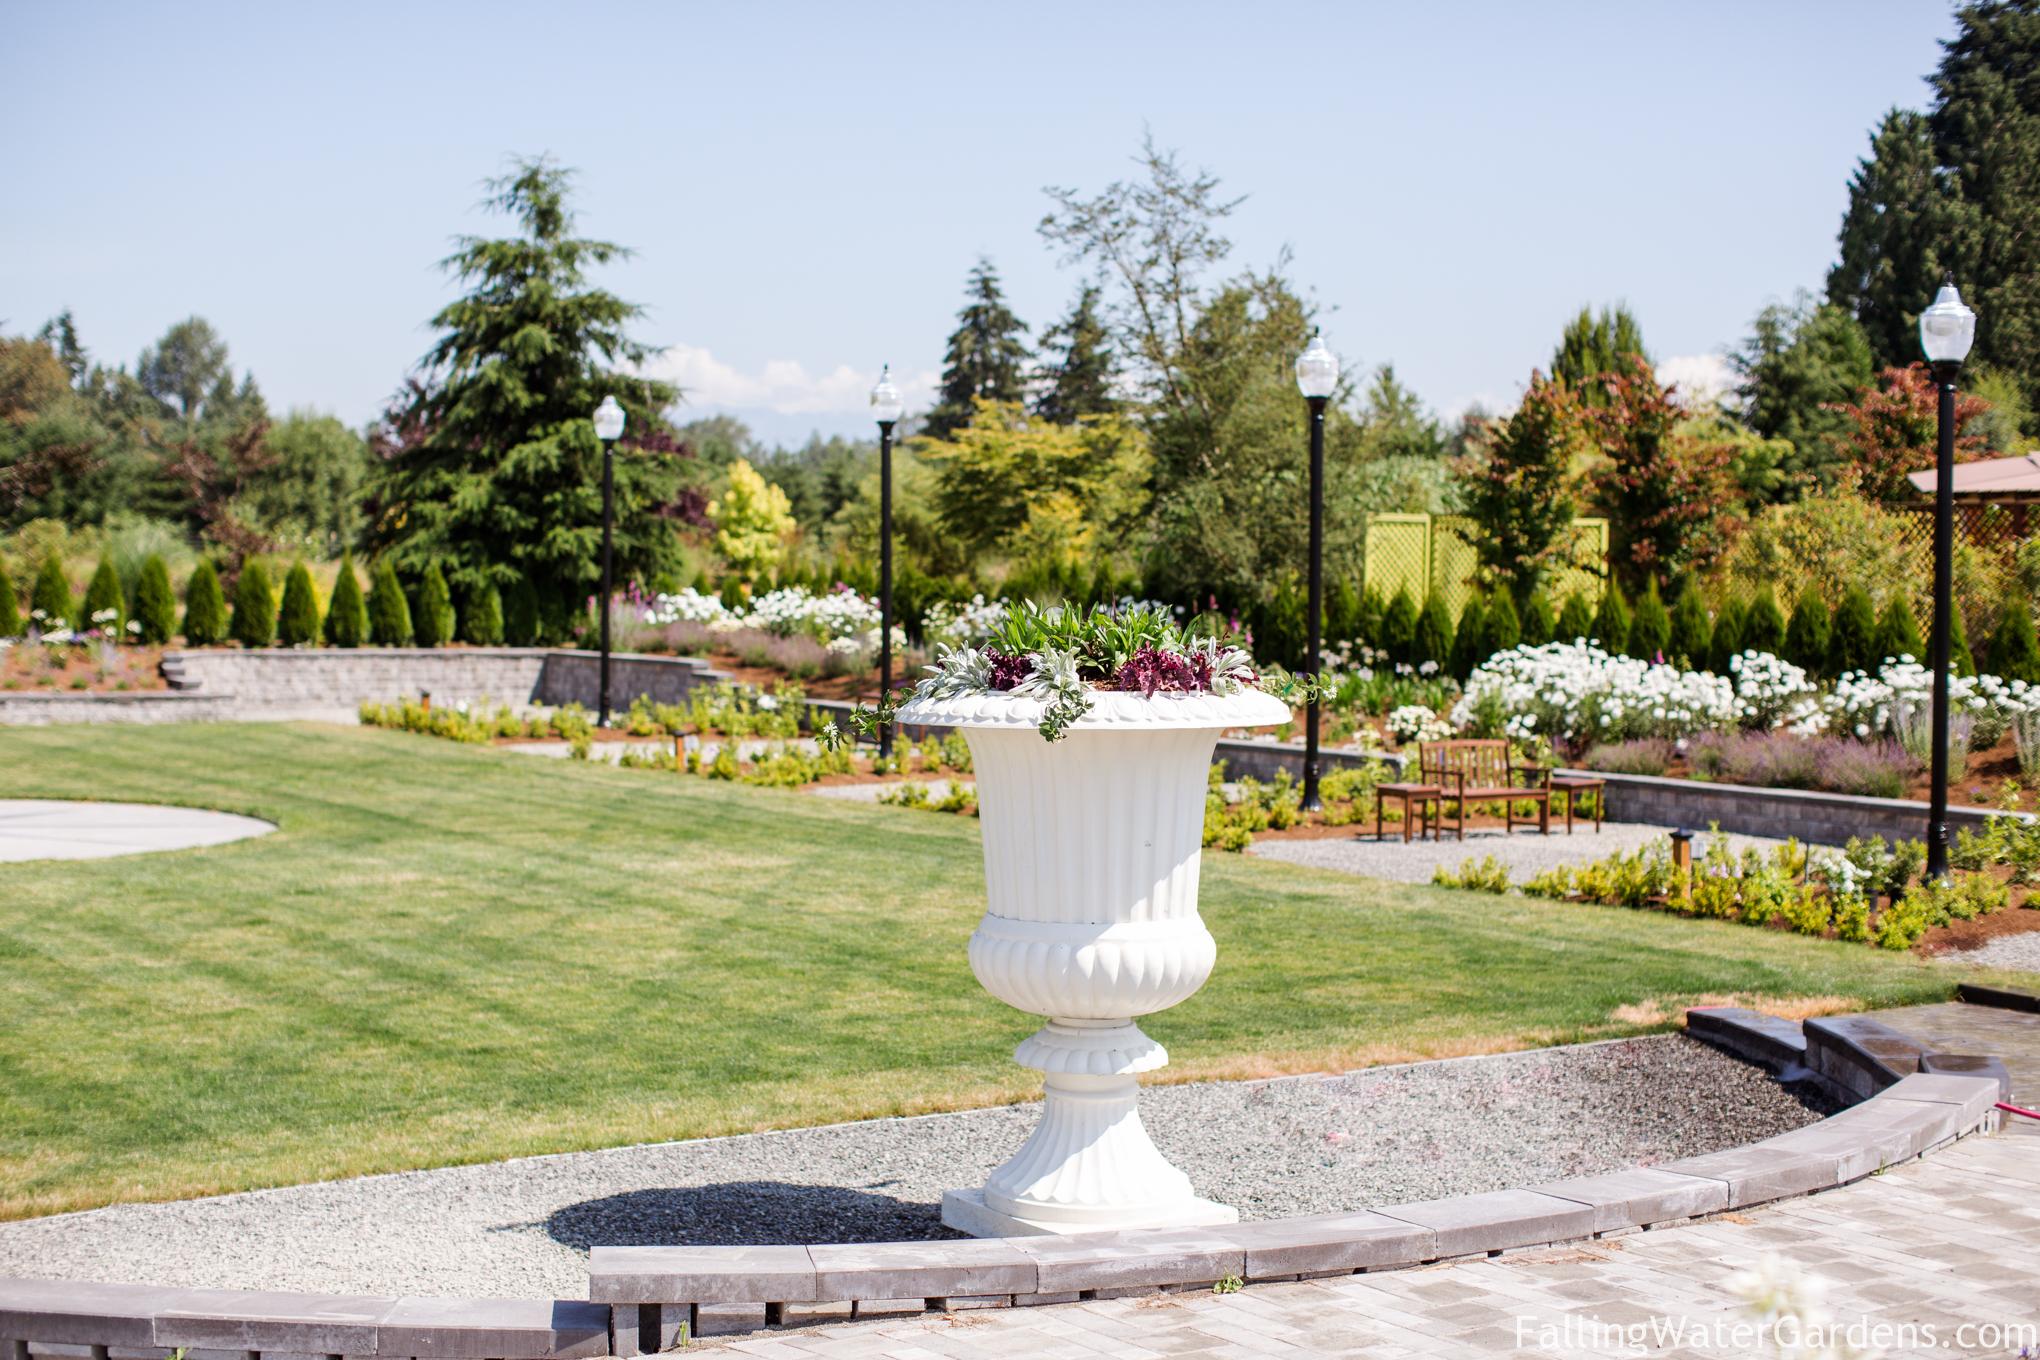 Formal_sunken_garden_wedding_venue_Falling_Water_Gardens_monroe_washington-1074